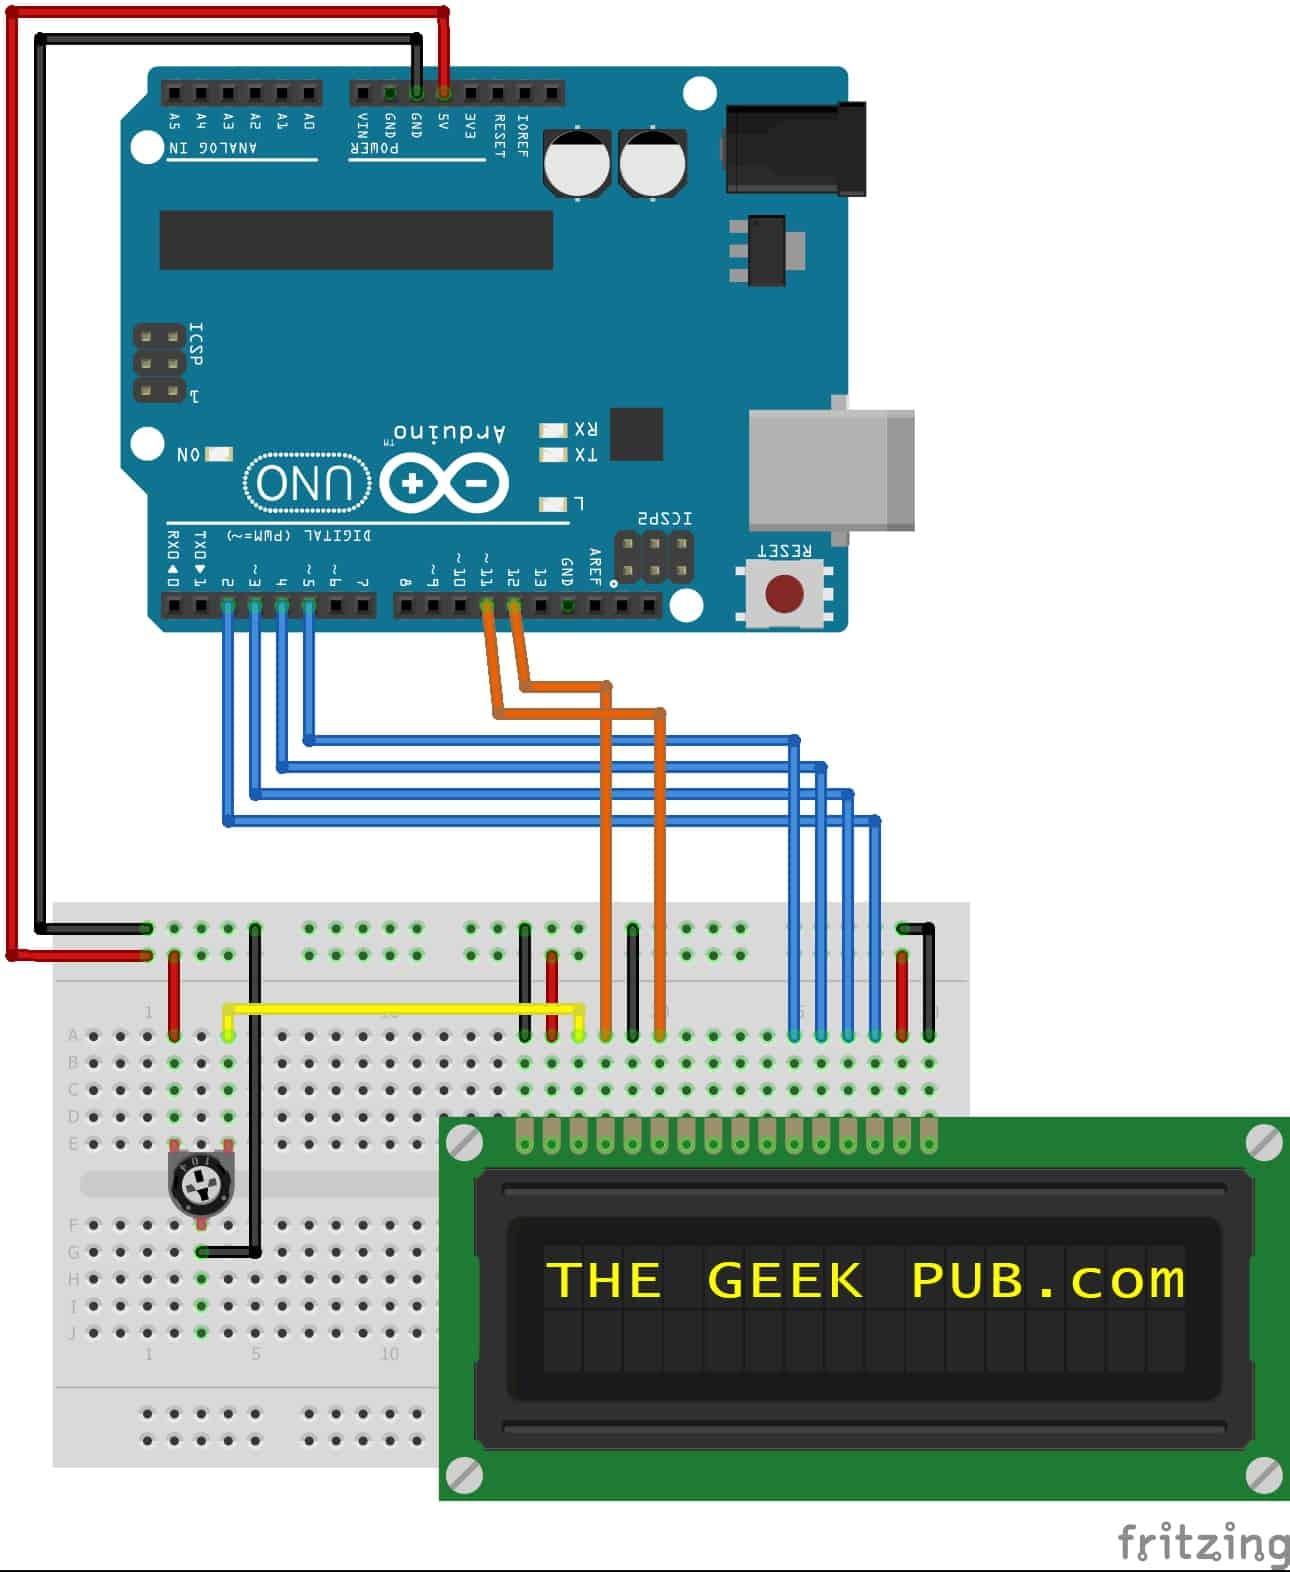 Wiring Diagram for Arduino Maker Arduino Lcd Display Wiring the Geek Pub Of Wiring Diagram for Arduino Maker